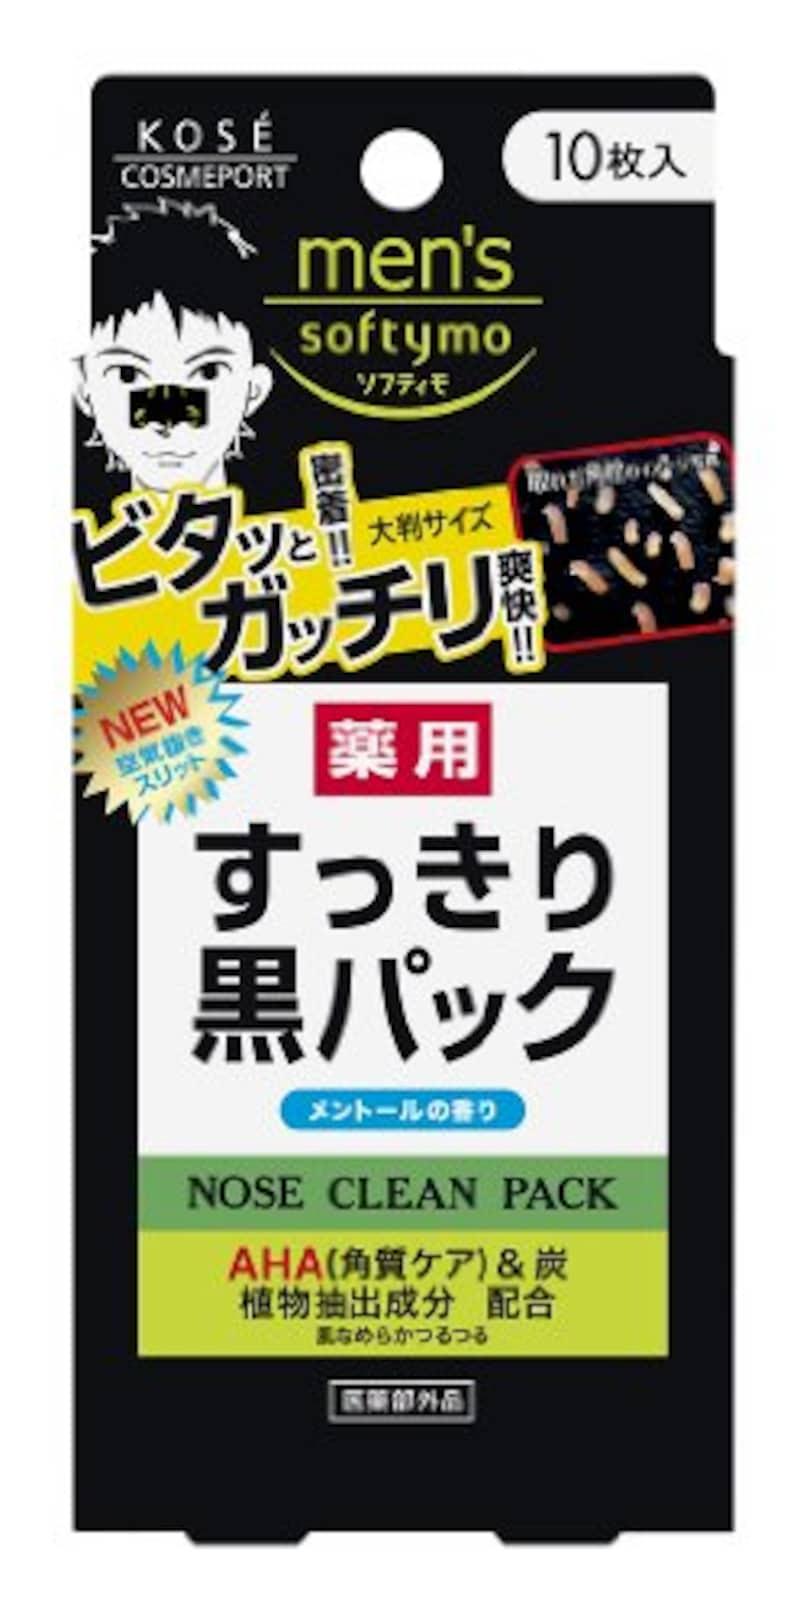 KOSE(コーセー),メンズ ソフティモ 薬用すっきり黒パック